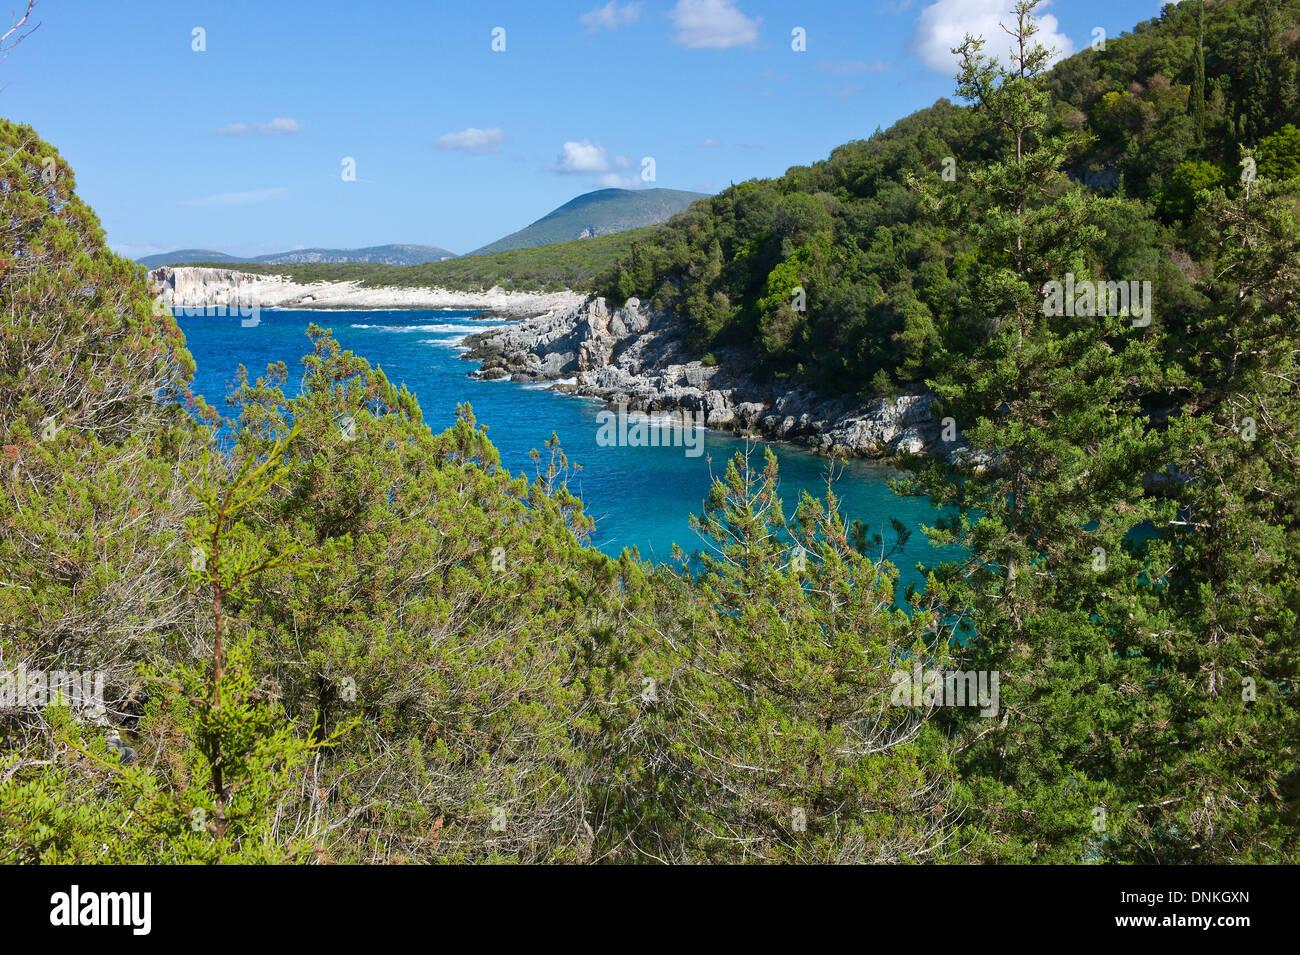 Overlooking the coastline above Dafnoudi Beach near Fiscardo, Cefalonia, Greece - Stock Image